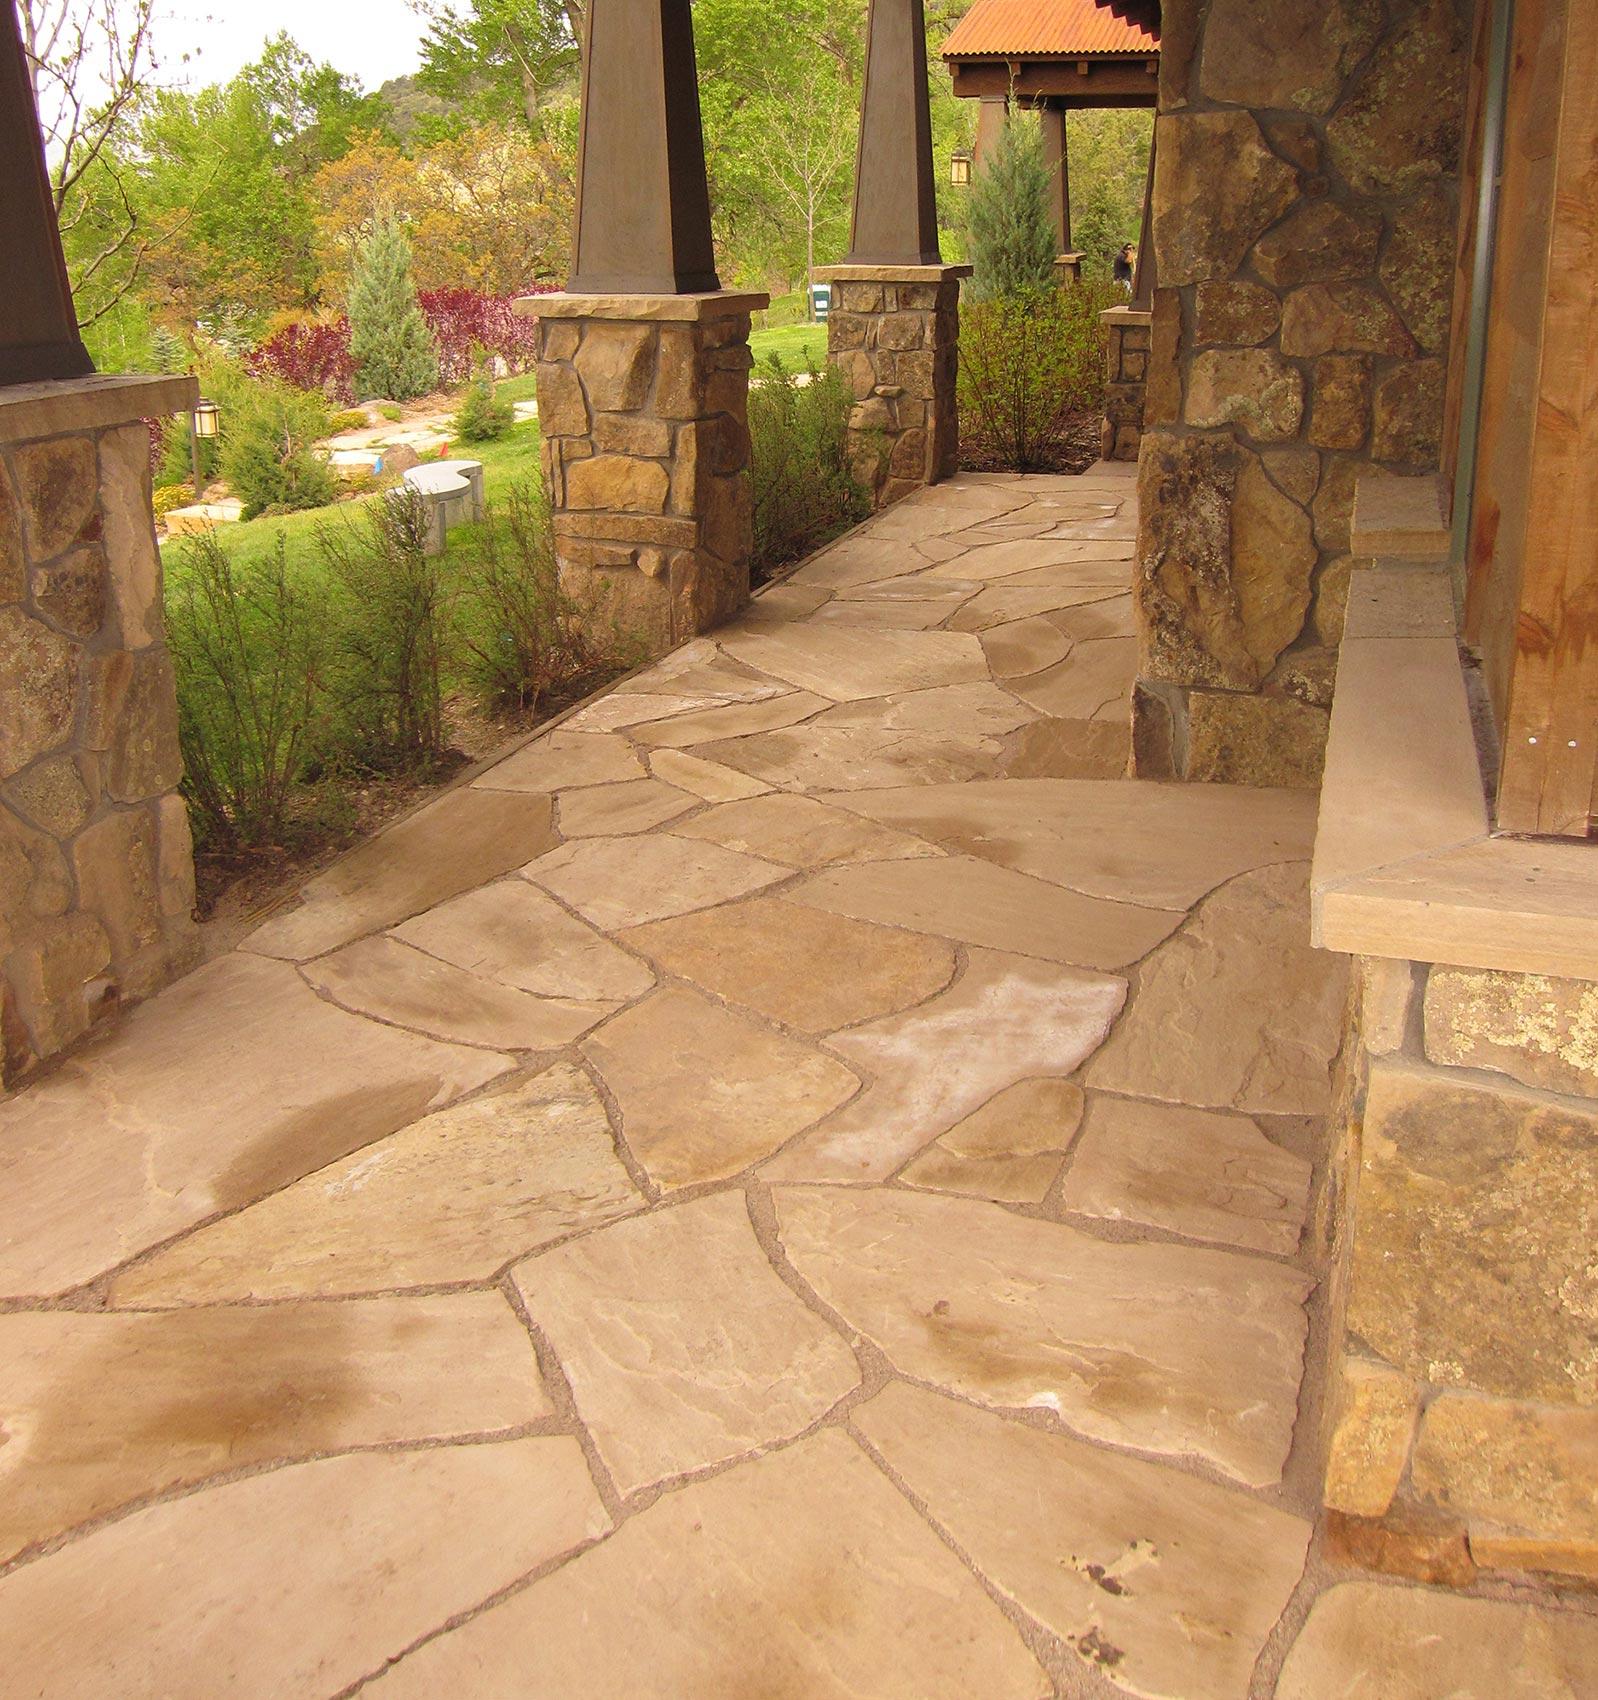 Residential patio walk